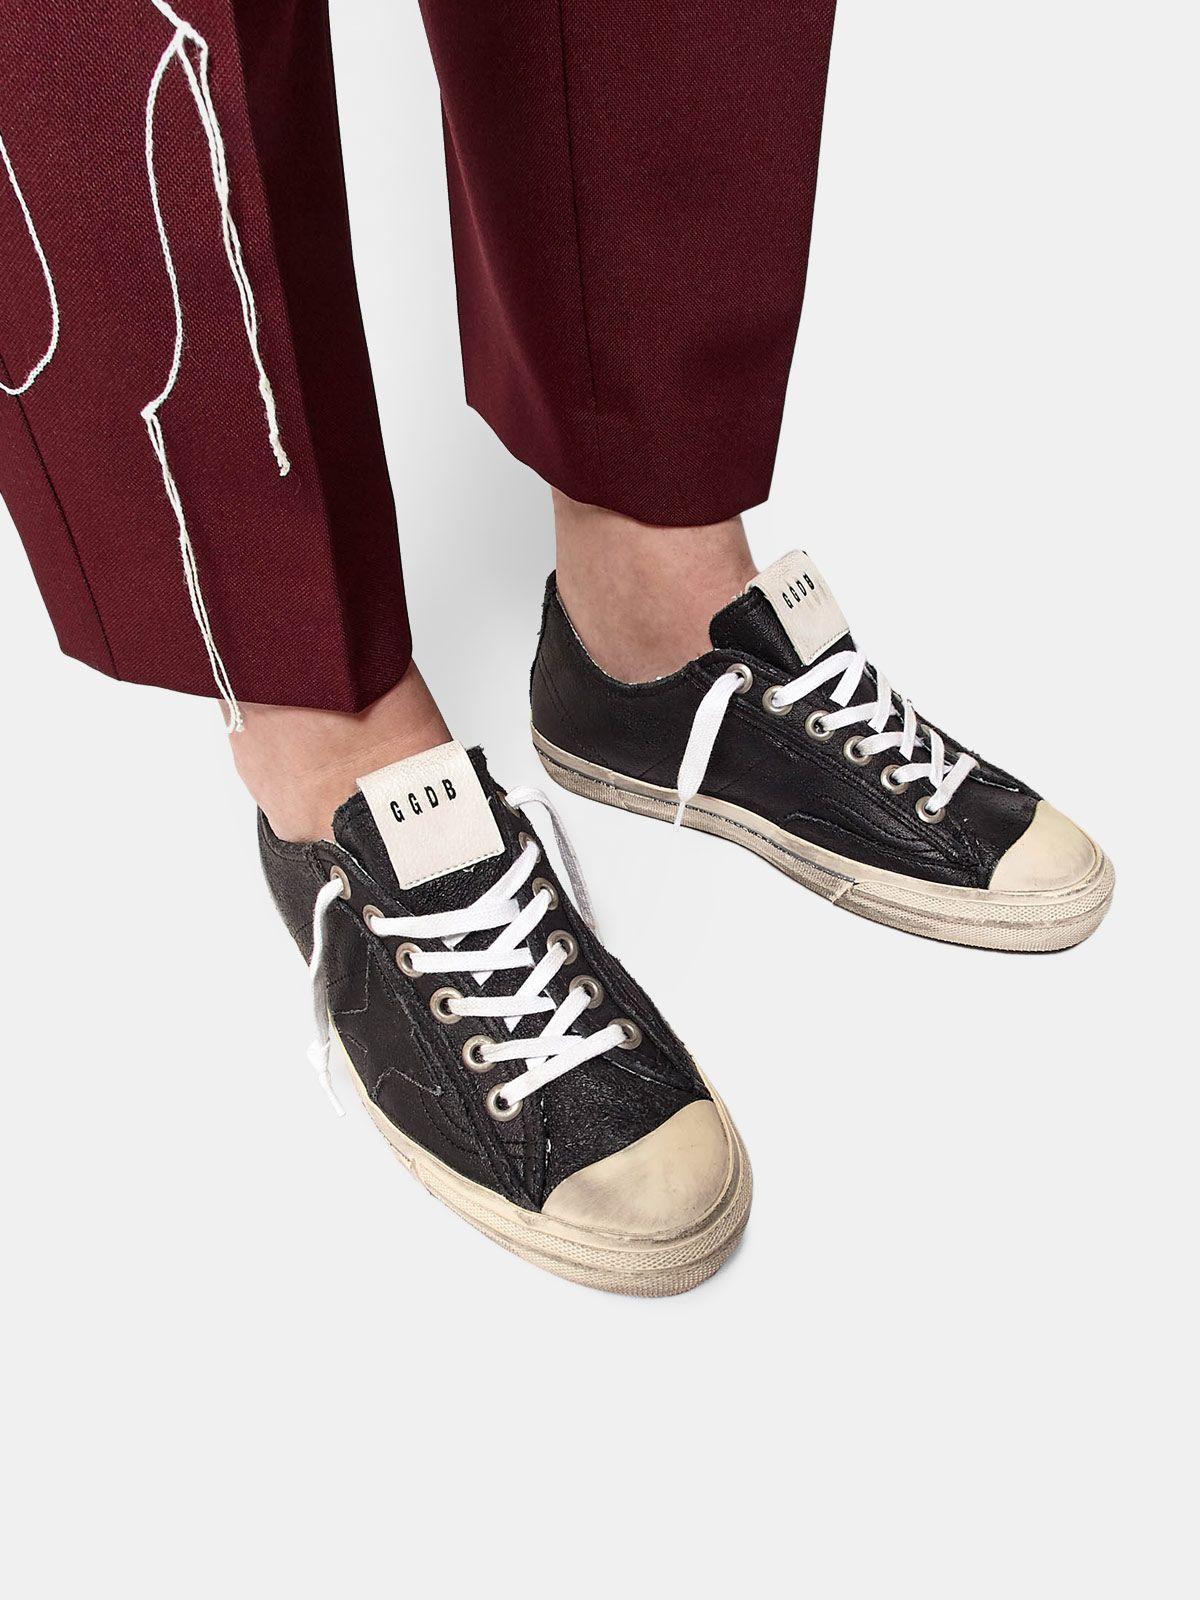 Golden Goose - V-STAR sneakers in vintage-effect leather in